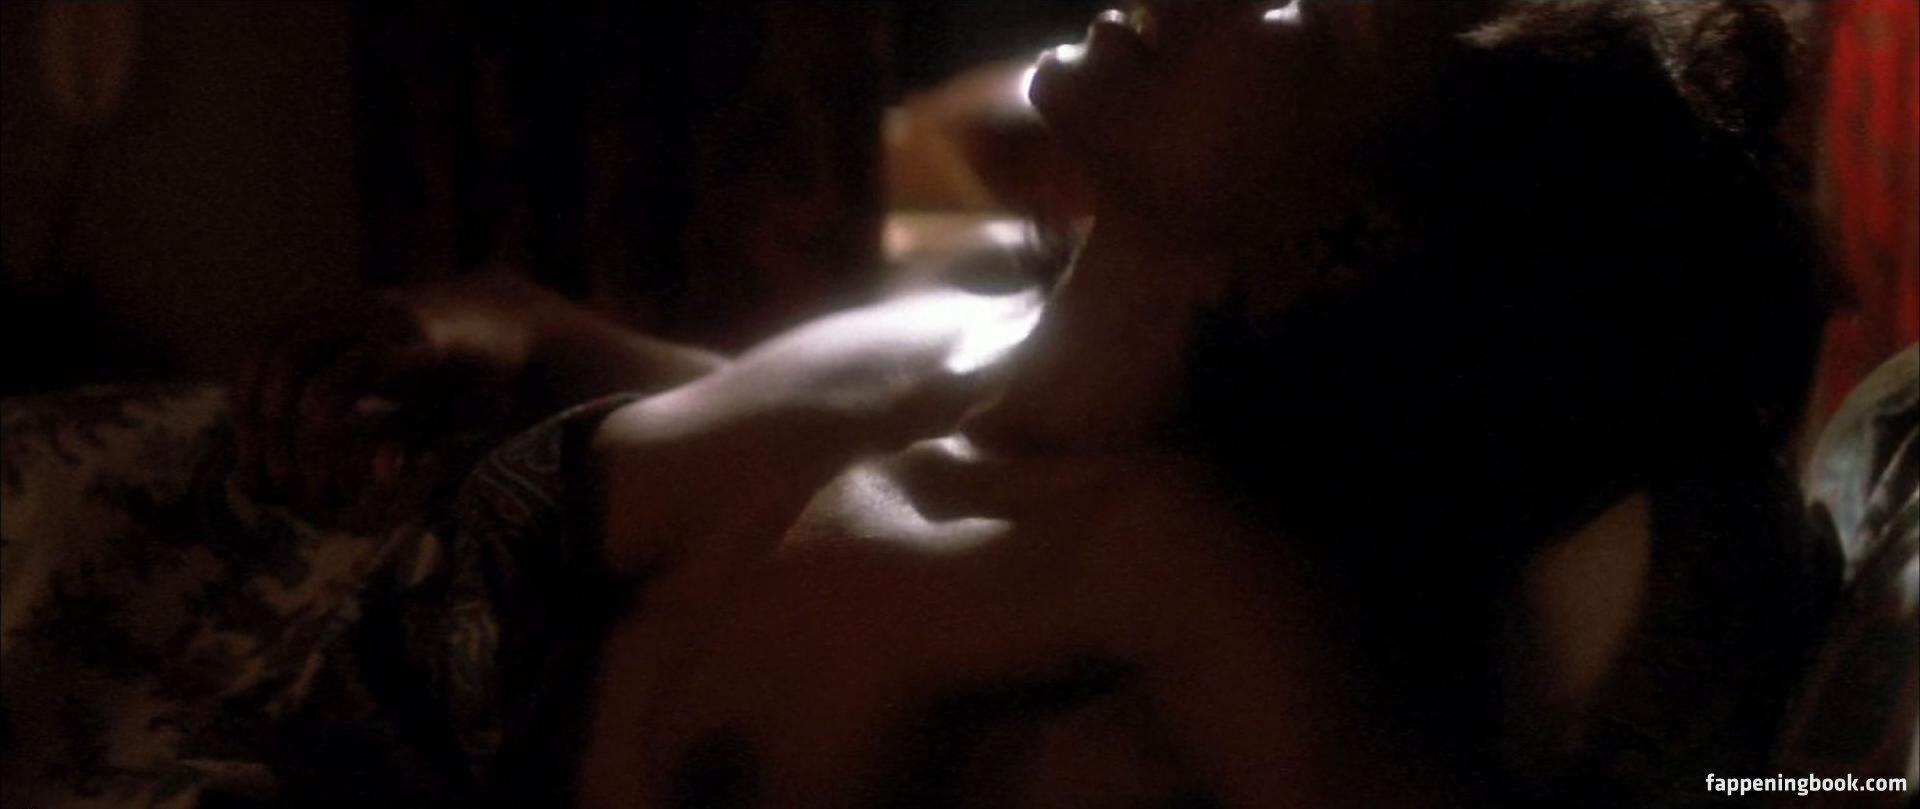 Angela Bassett Nude Pics angela bassett nude, sexy, the fappening, uncensored - photo